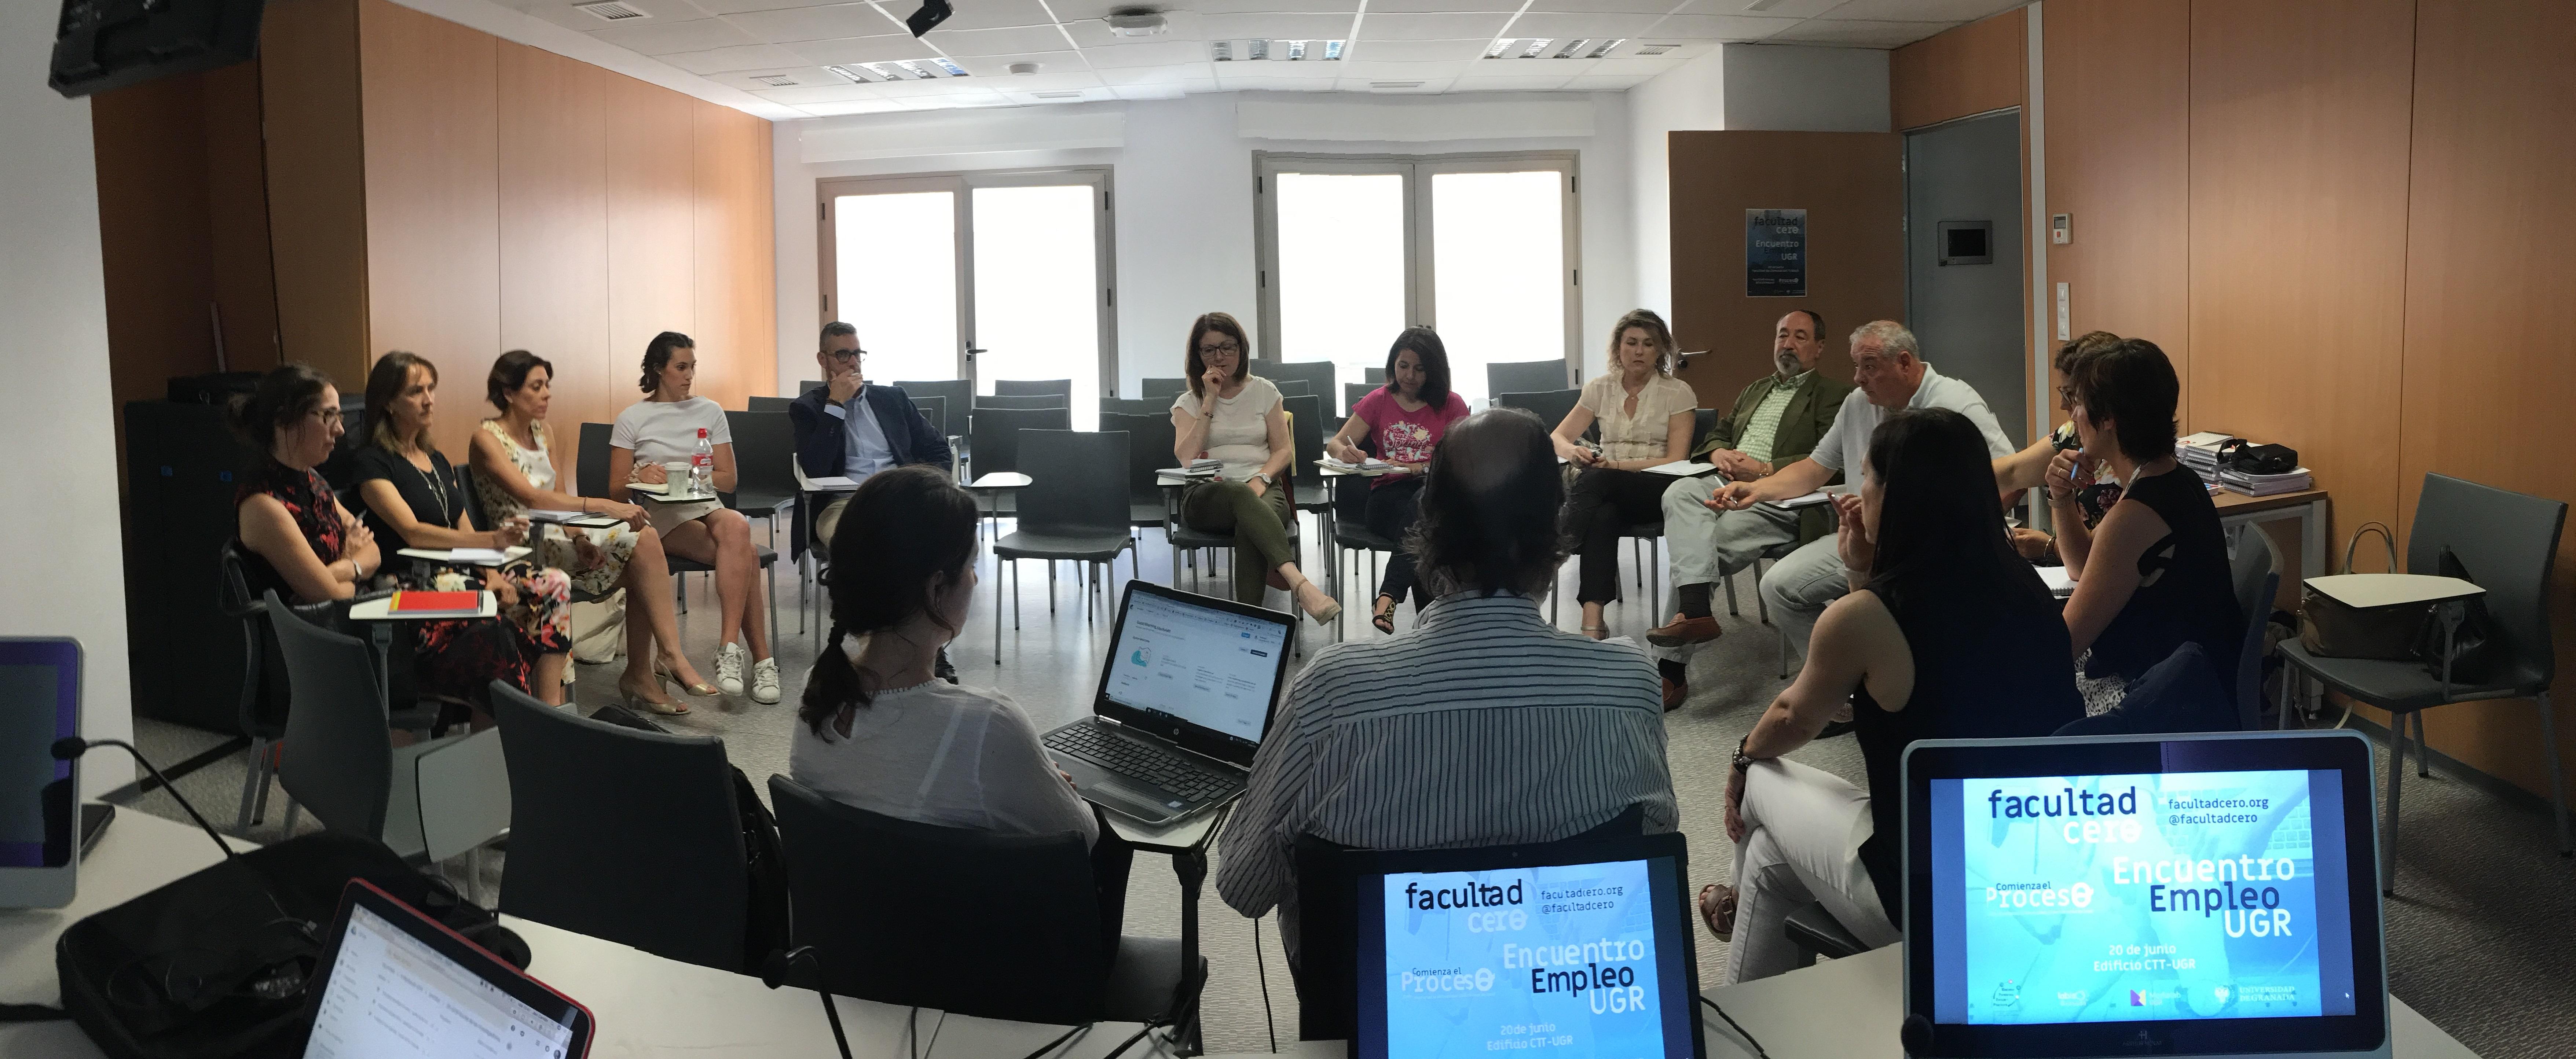 Crónica Encuentro Empleo/Empleabilidad UGR